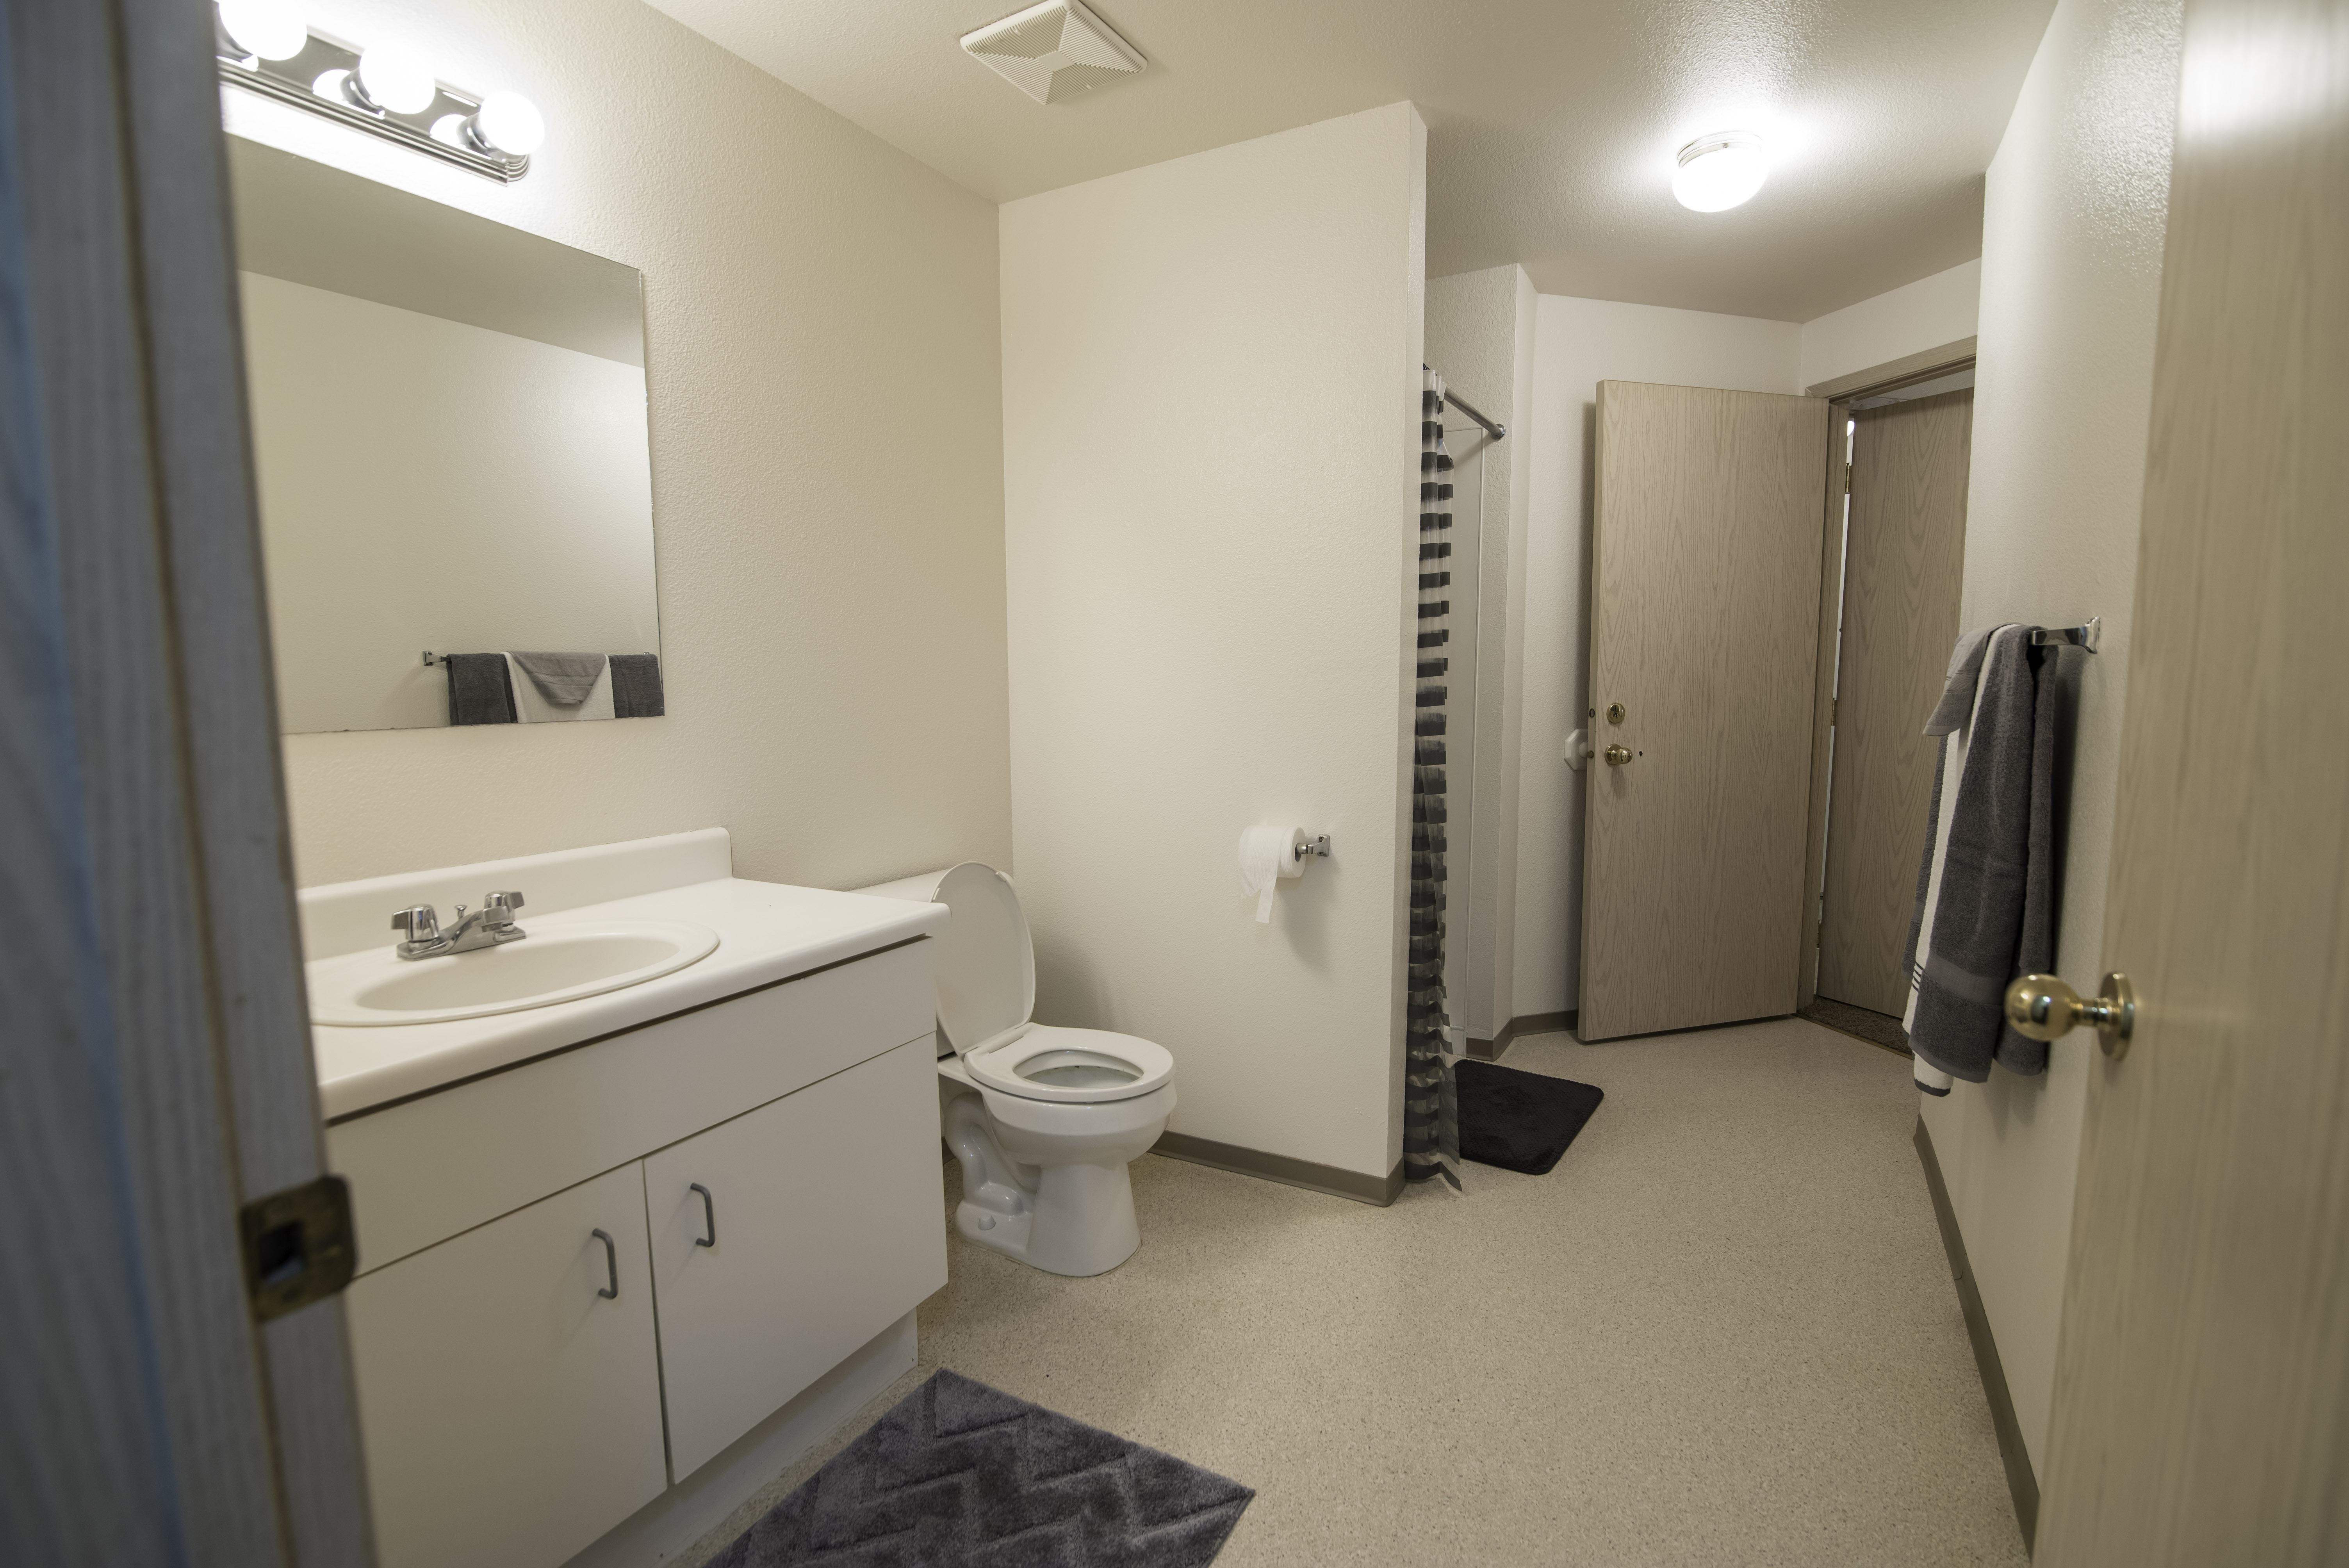 Cougar Crest Apartments Pullman Wa